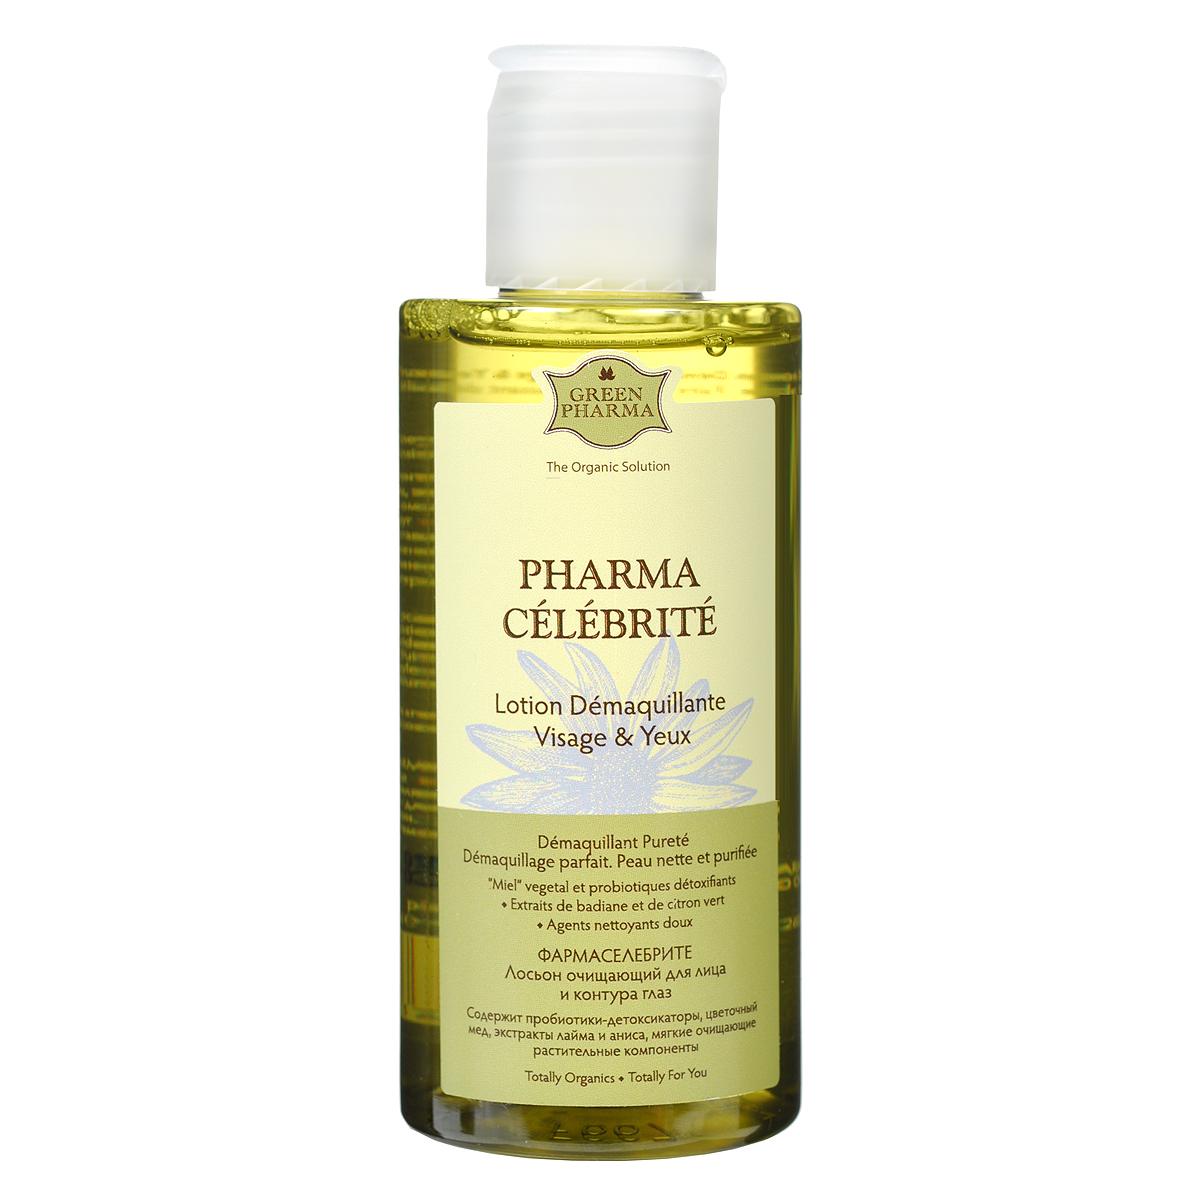 Greenpharma Лосьон для лица и контура глаз, очищающий, 150 мл spa pharma лосьон для лица для жирной и проблемной кожи spa pharma 235 мл